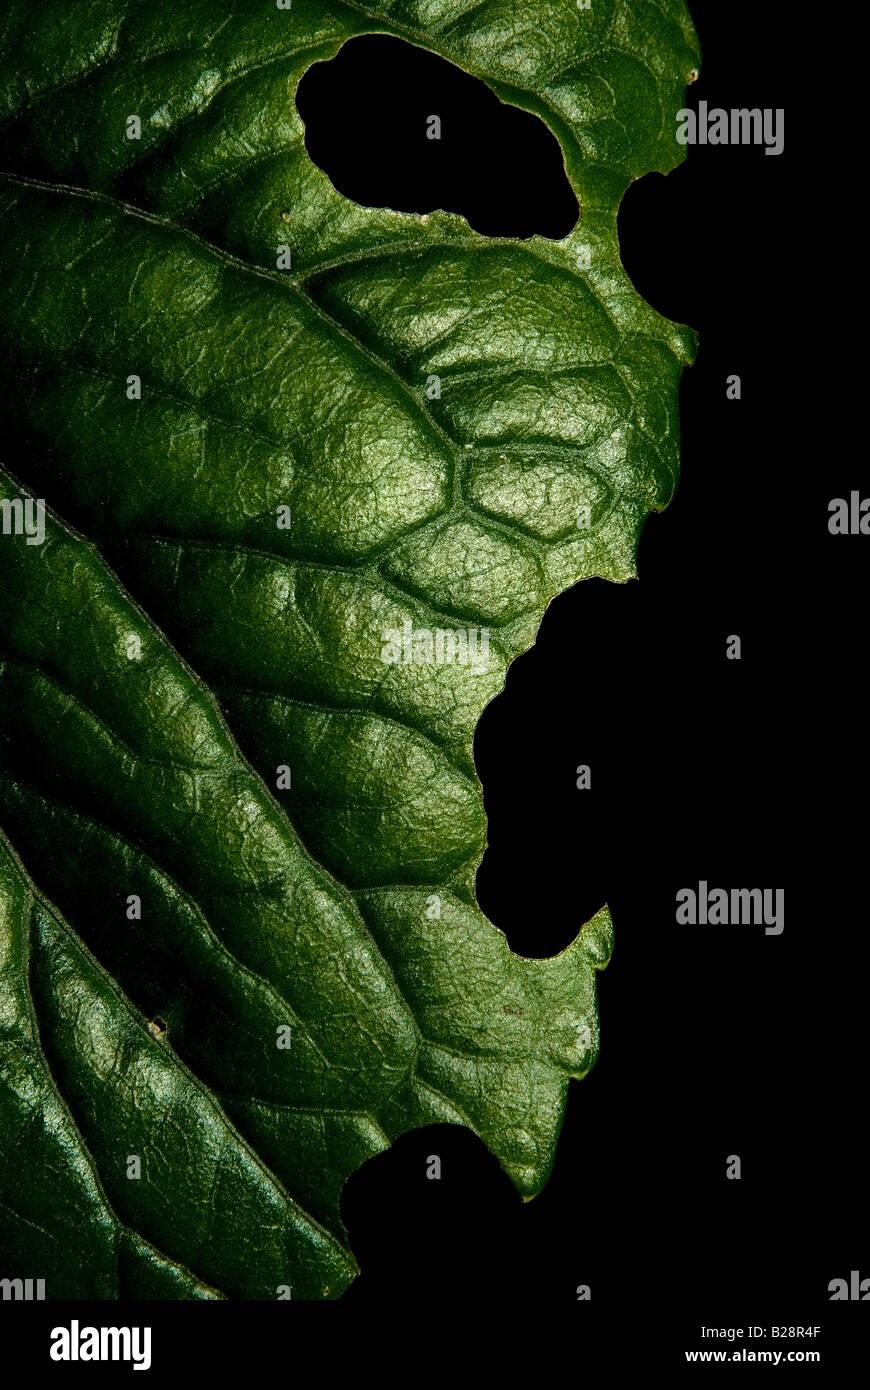 Grüne Pflanze. Blatt-Gesicht. Stockbild